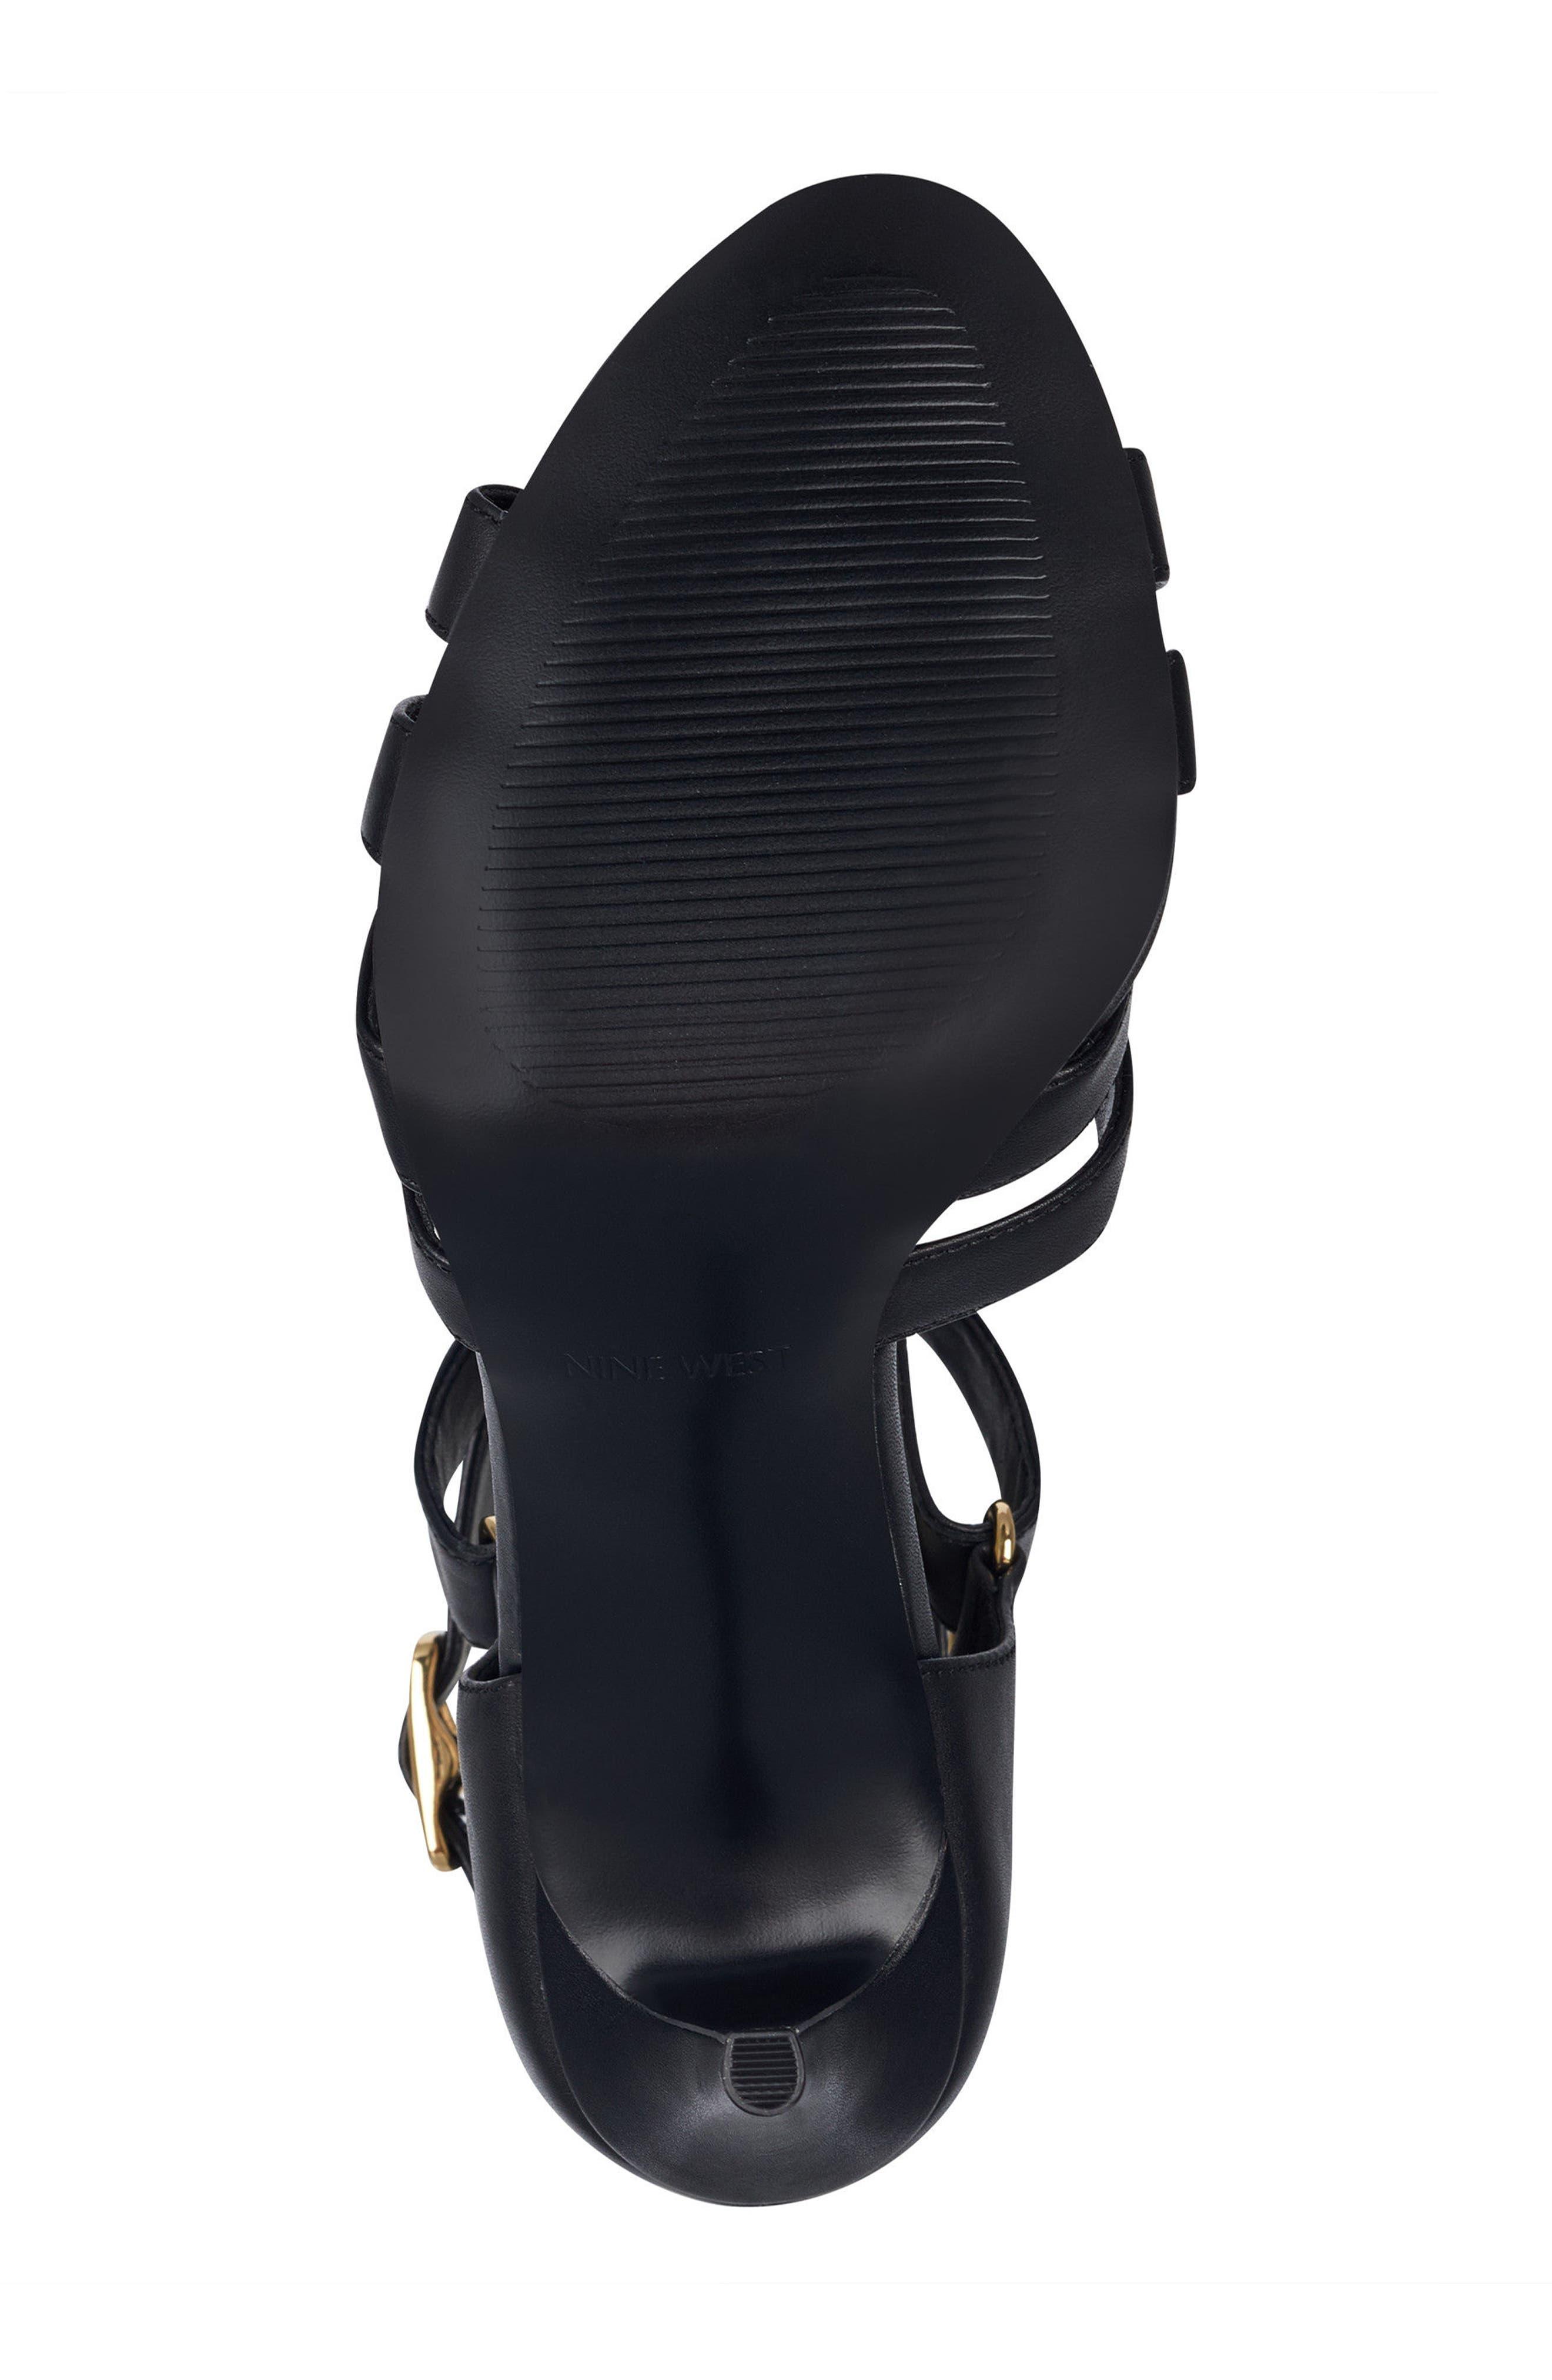 McGlynn Strappy Sandal,                             Alternate thumbnail 6, color,                             Black Leather